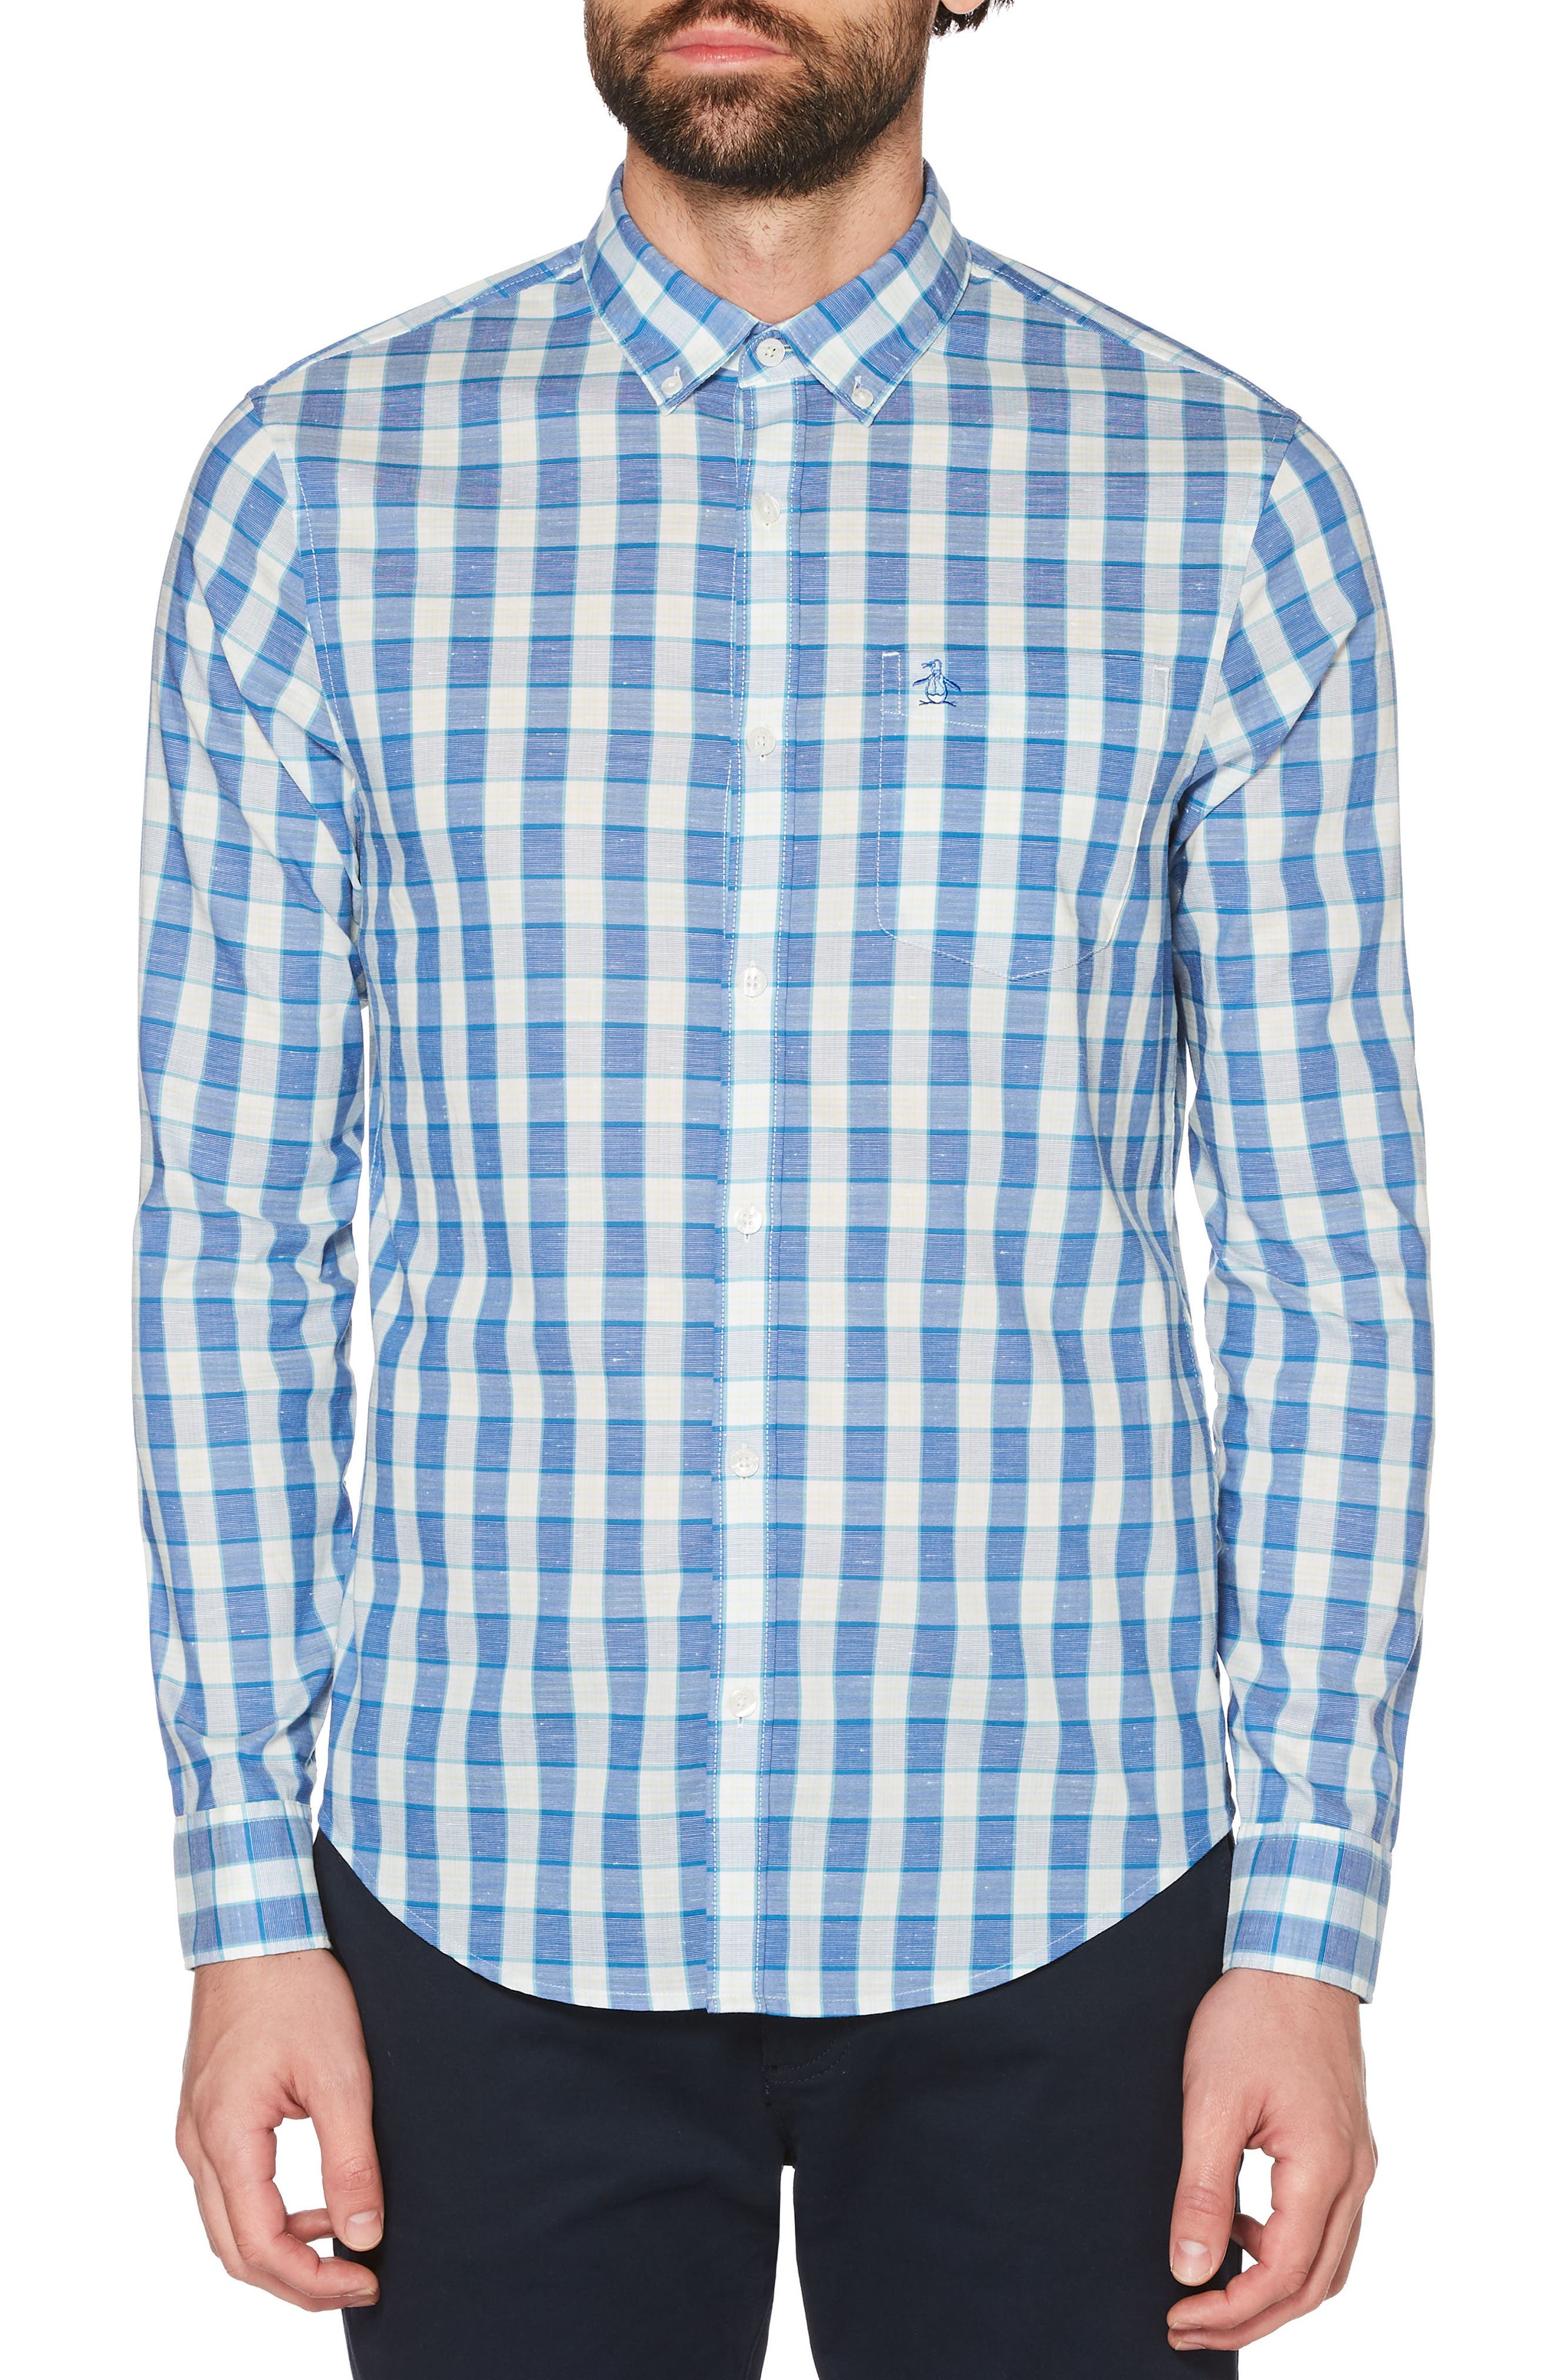 Nep Plaid Woven Shirt,                             Main thumbnail 1, color,                             462